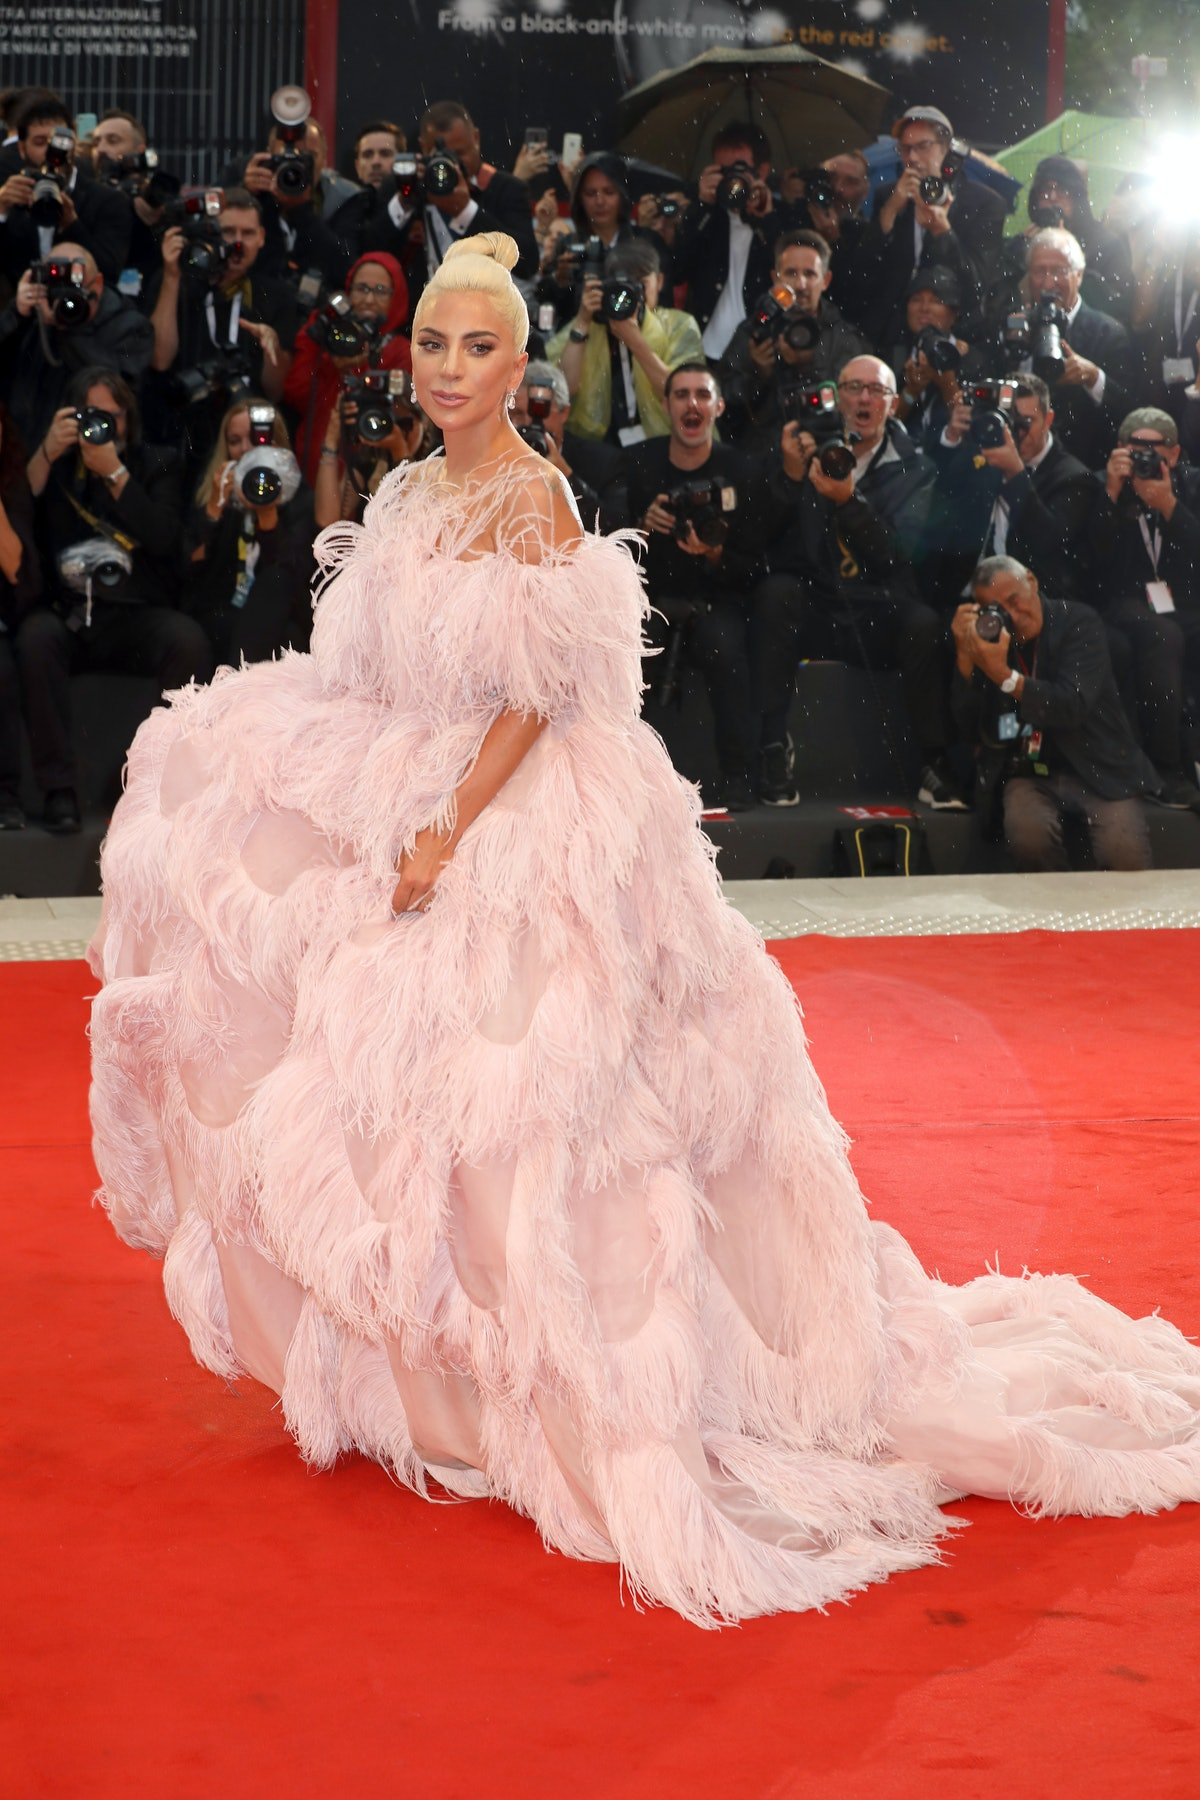 A Star Is Born Red Carpet Arrivals - 75th Venice Film Festival